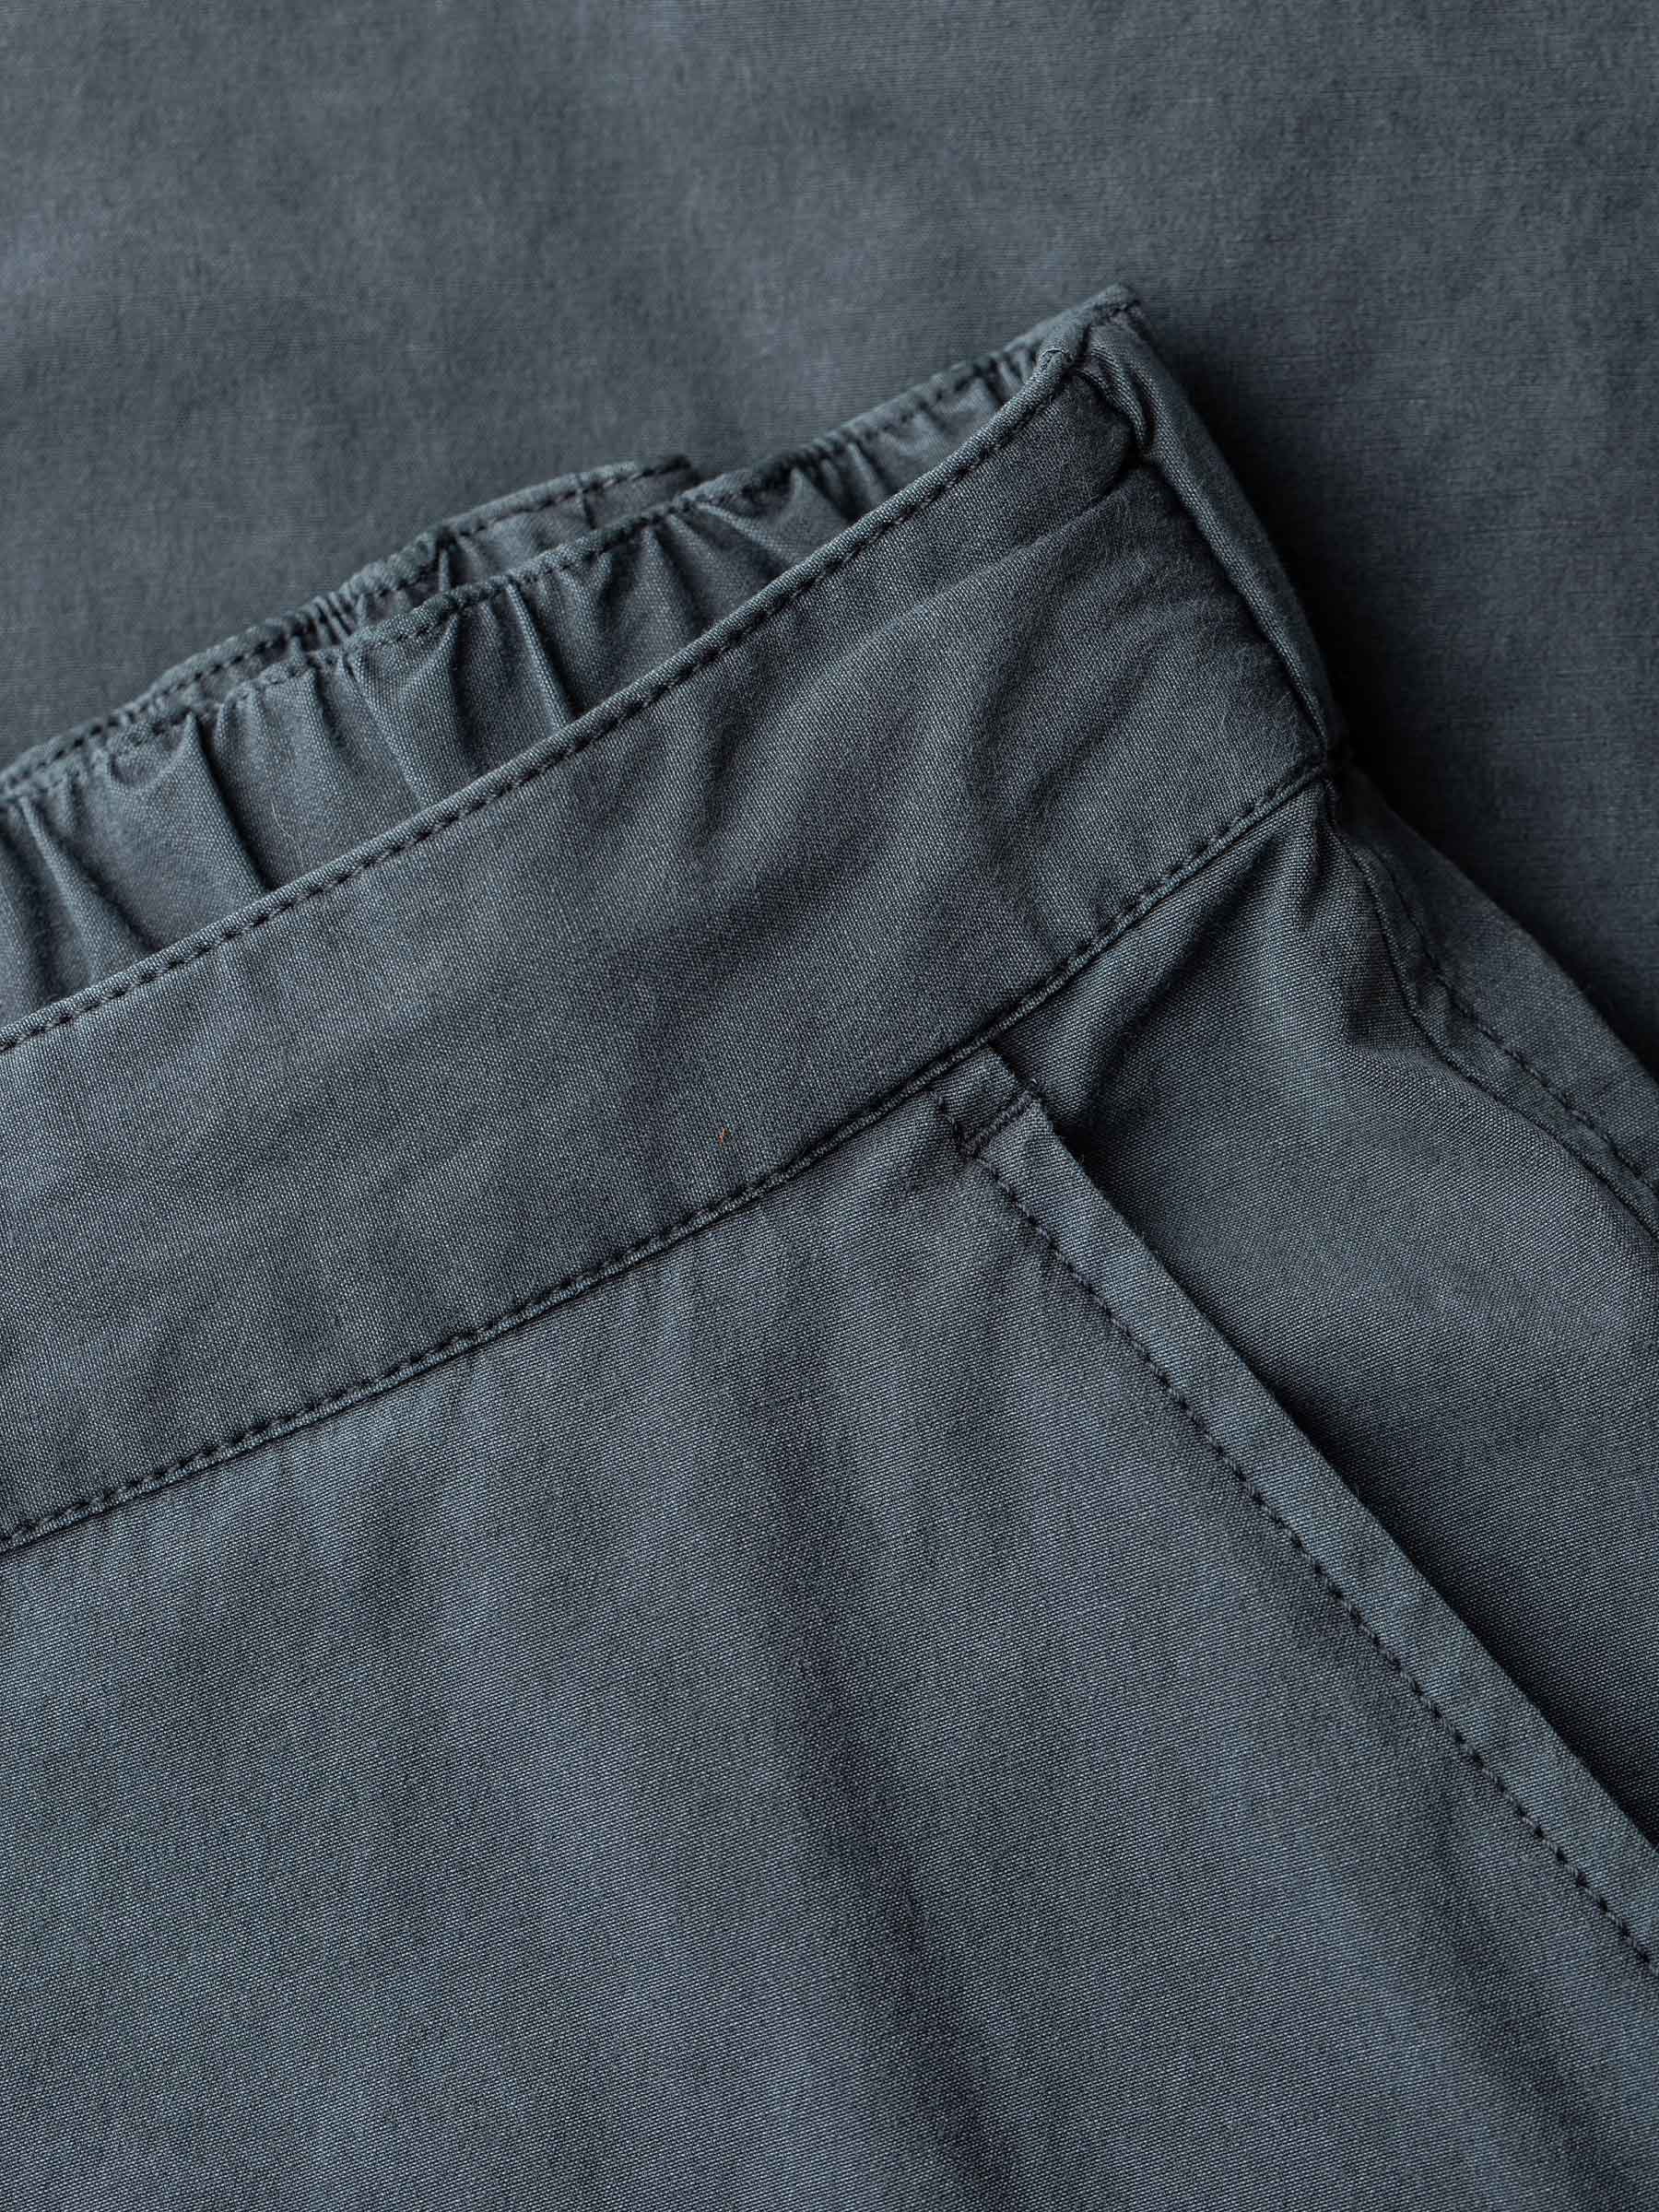 Buck Mason - Vintage Olive Deck Short